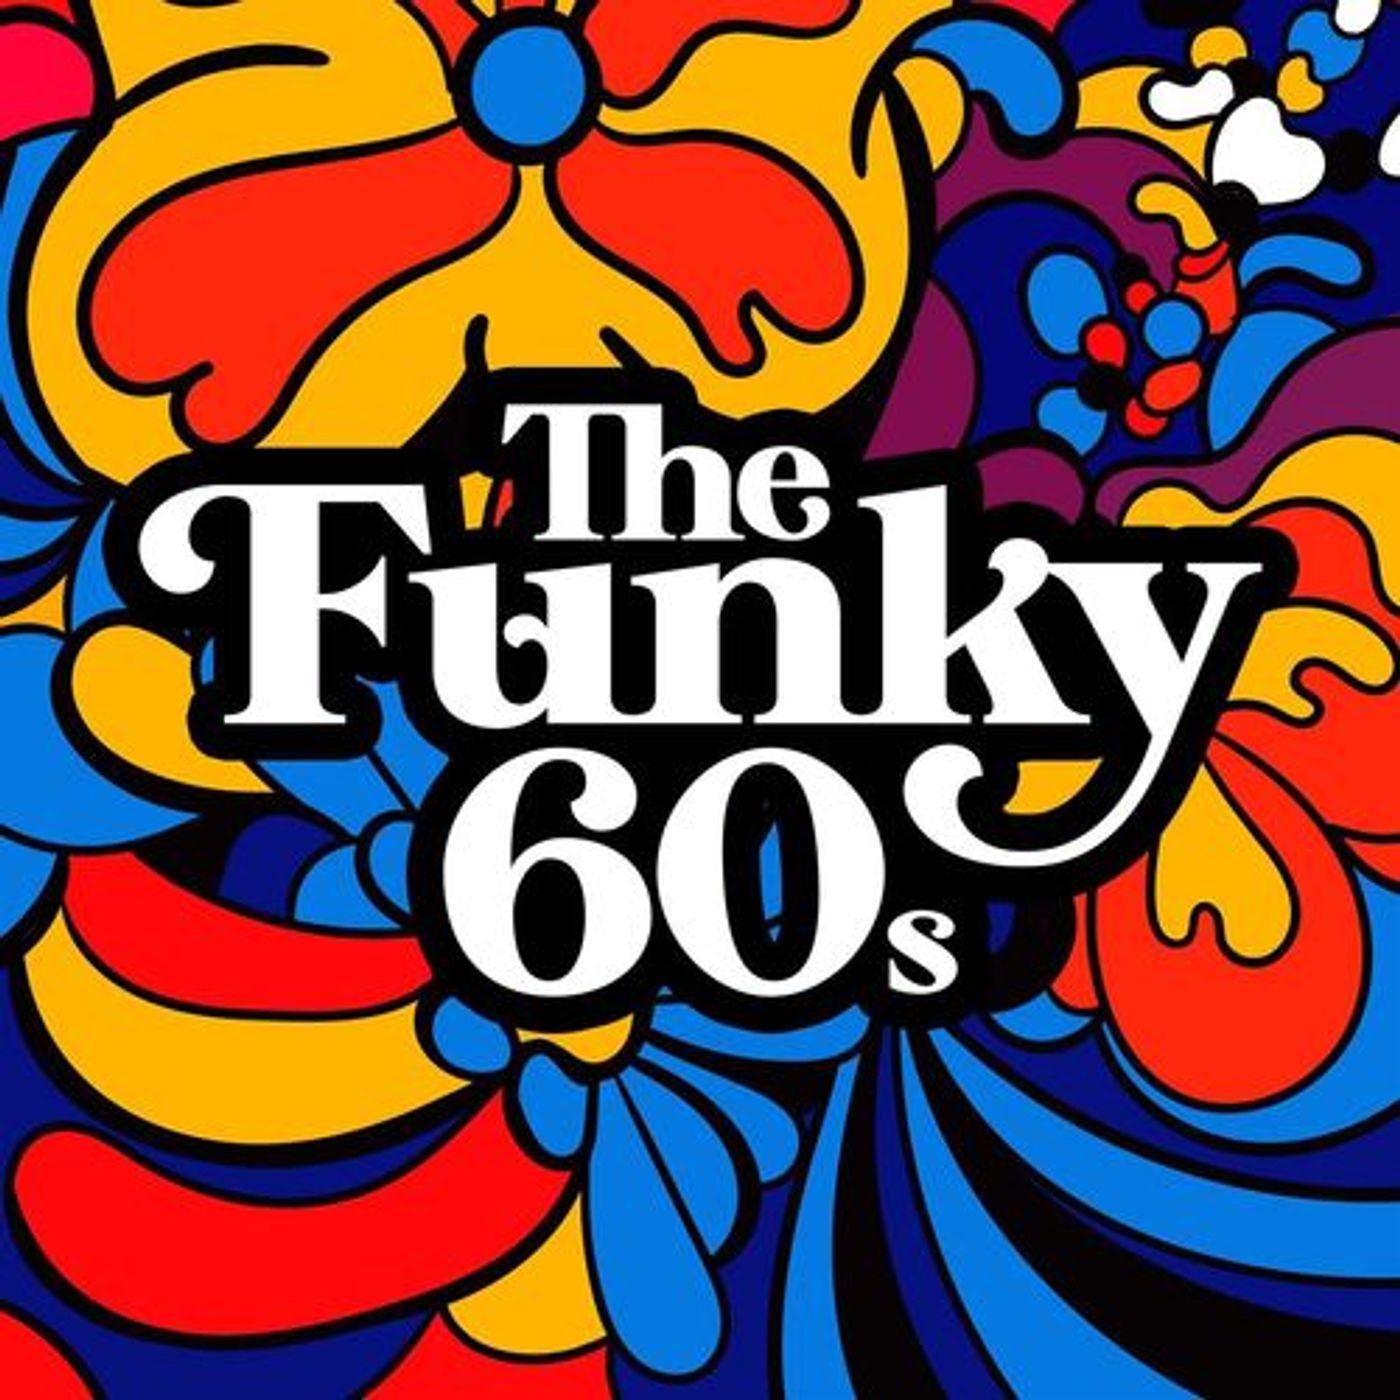 ESPECIAL  THE FUNKY 60s pt02 #washyourhands #stayhome #wearamask #avengers #TUDUM #shadowsfx #venom2 #venom #theview #shangchi #doompatrol